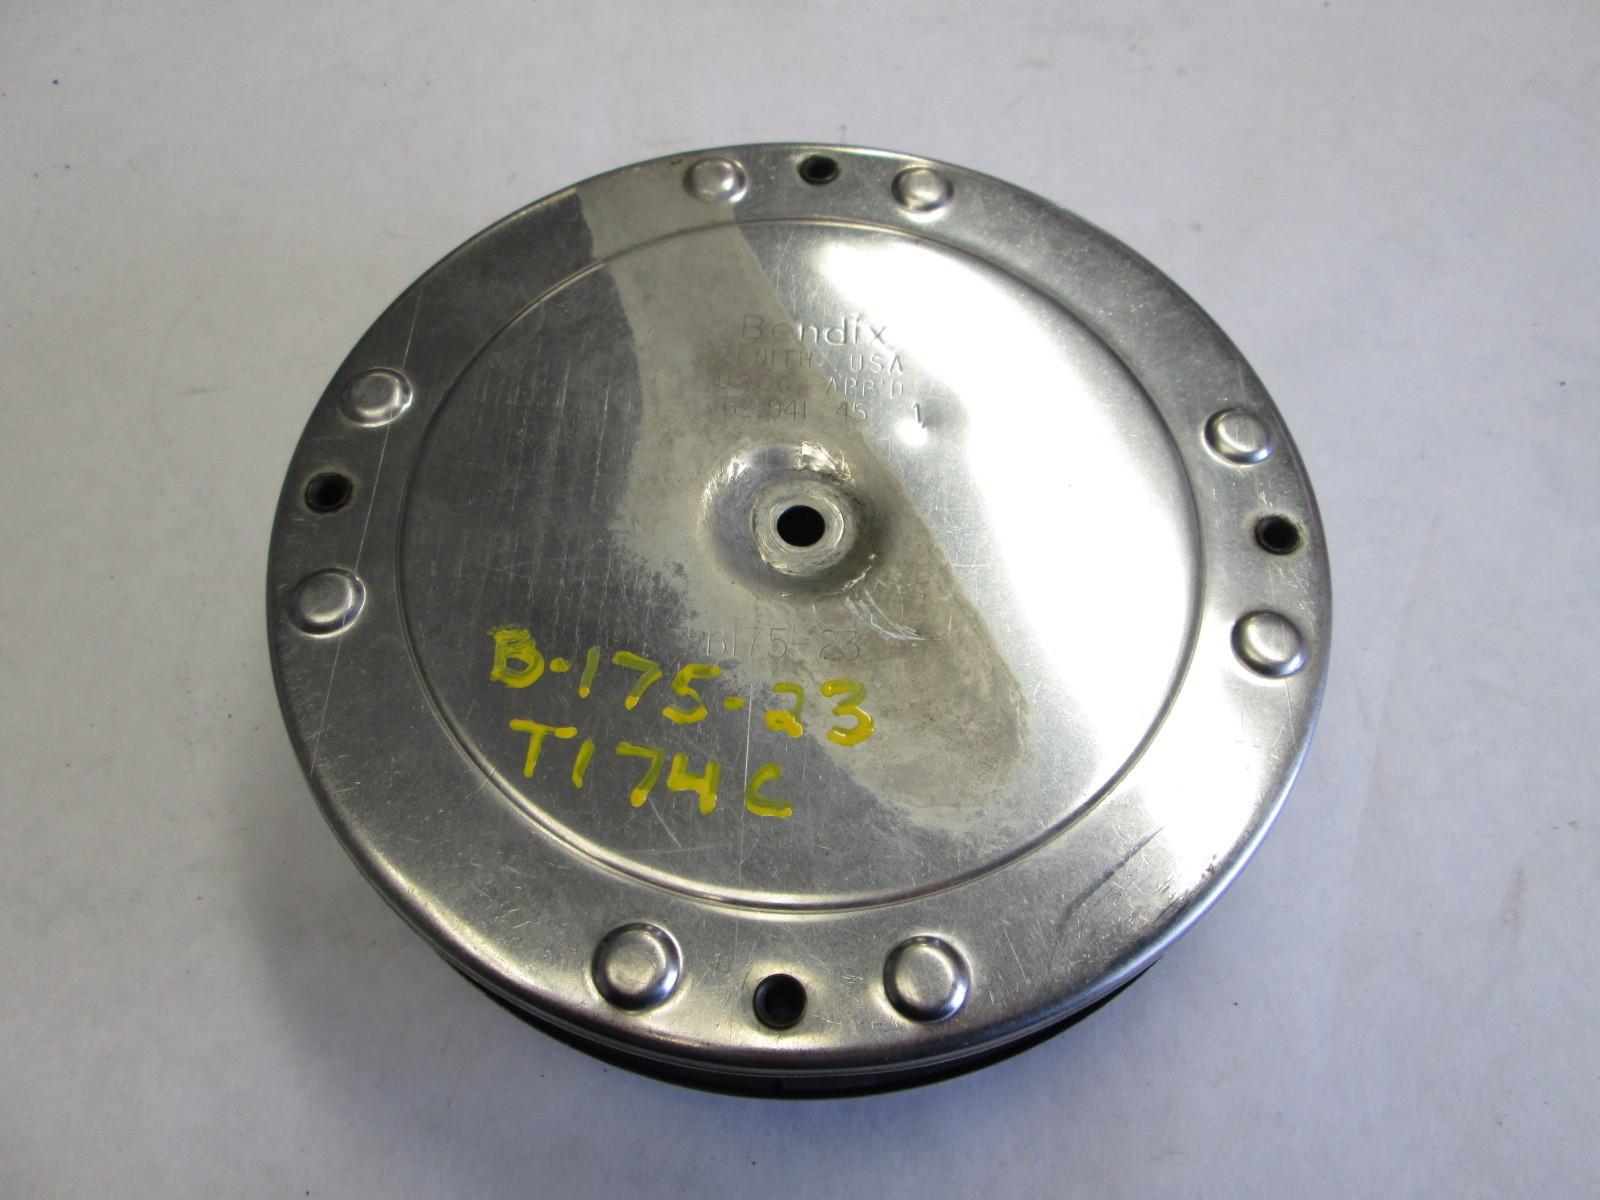 "B175-23 Mercruiser Stainless Bendix Carburetor Flame Arrestor 2 5/8"" Throat"